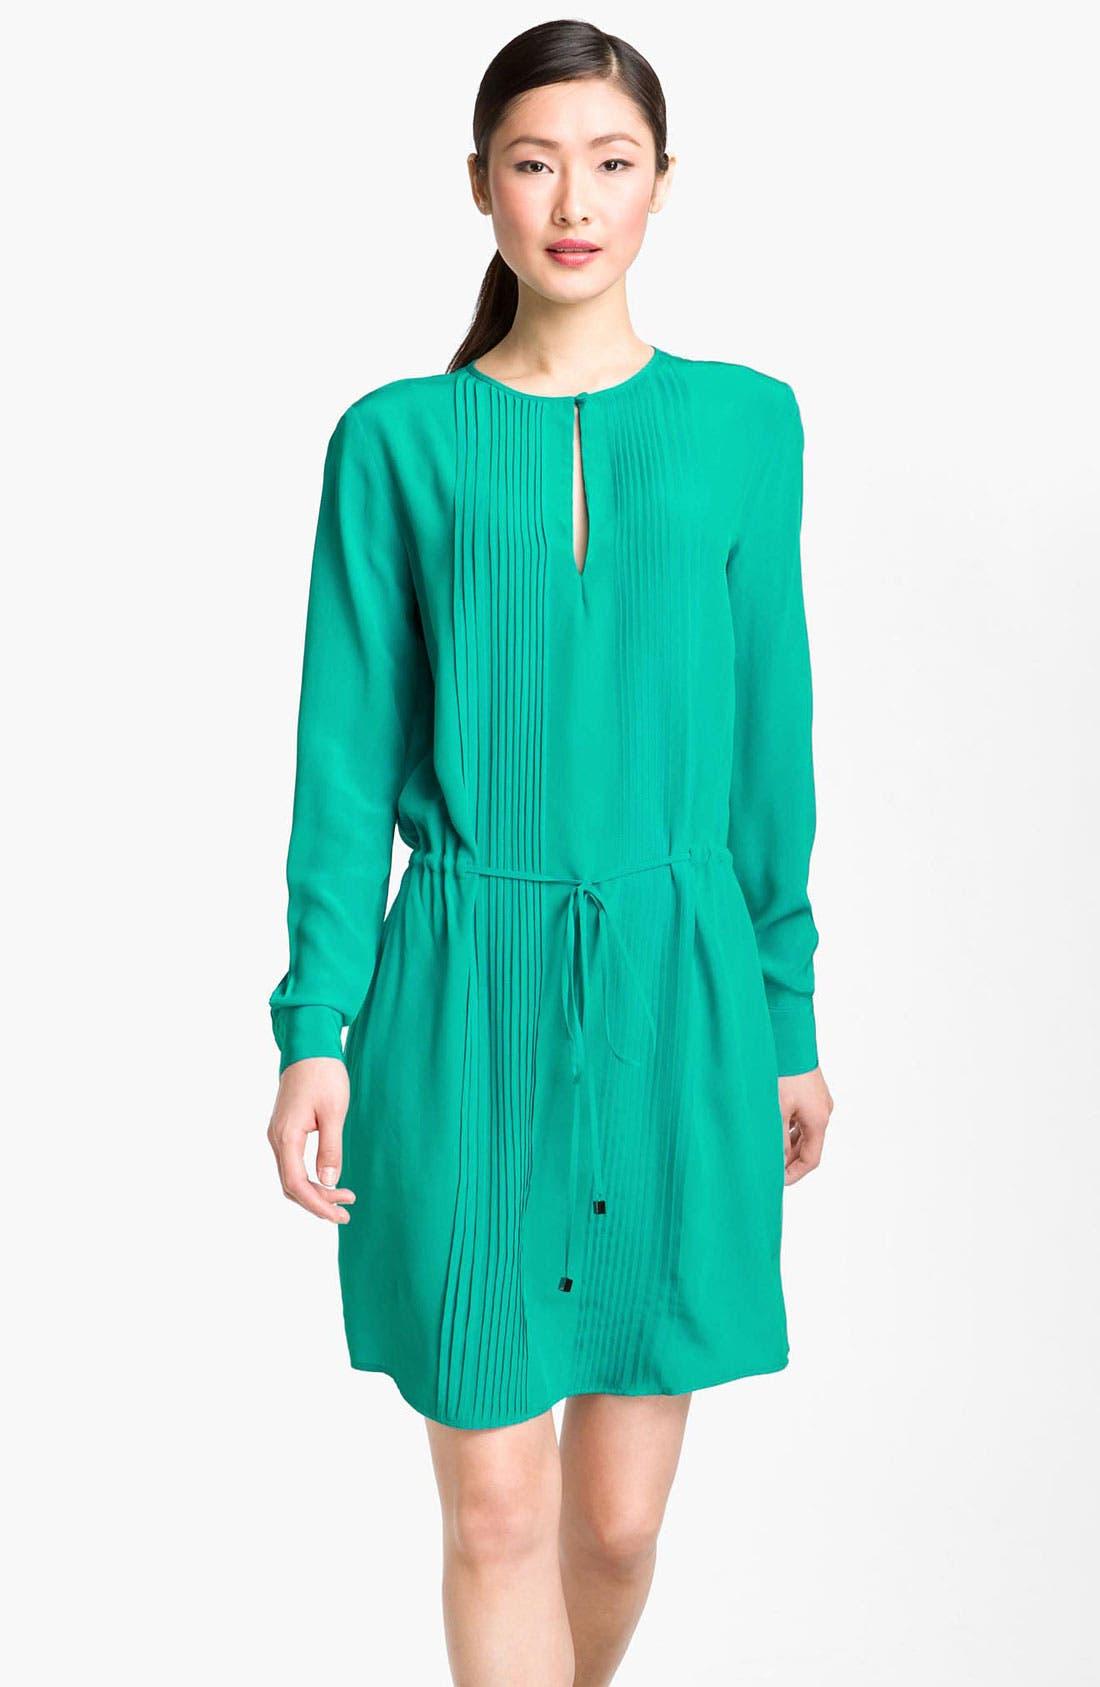 Main Image - Suzi Chin for Maggy Boutique Pintuck Silk Shirtdress